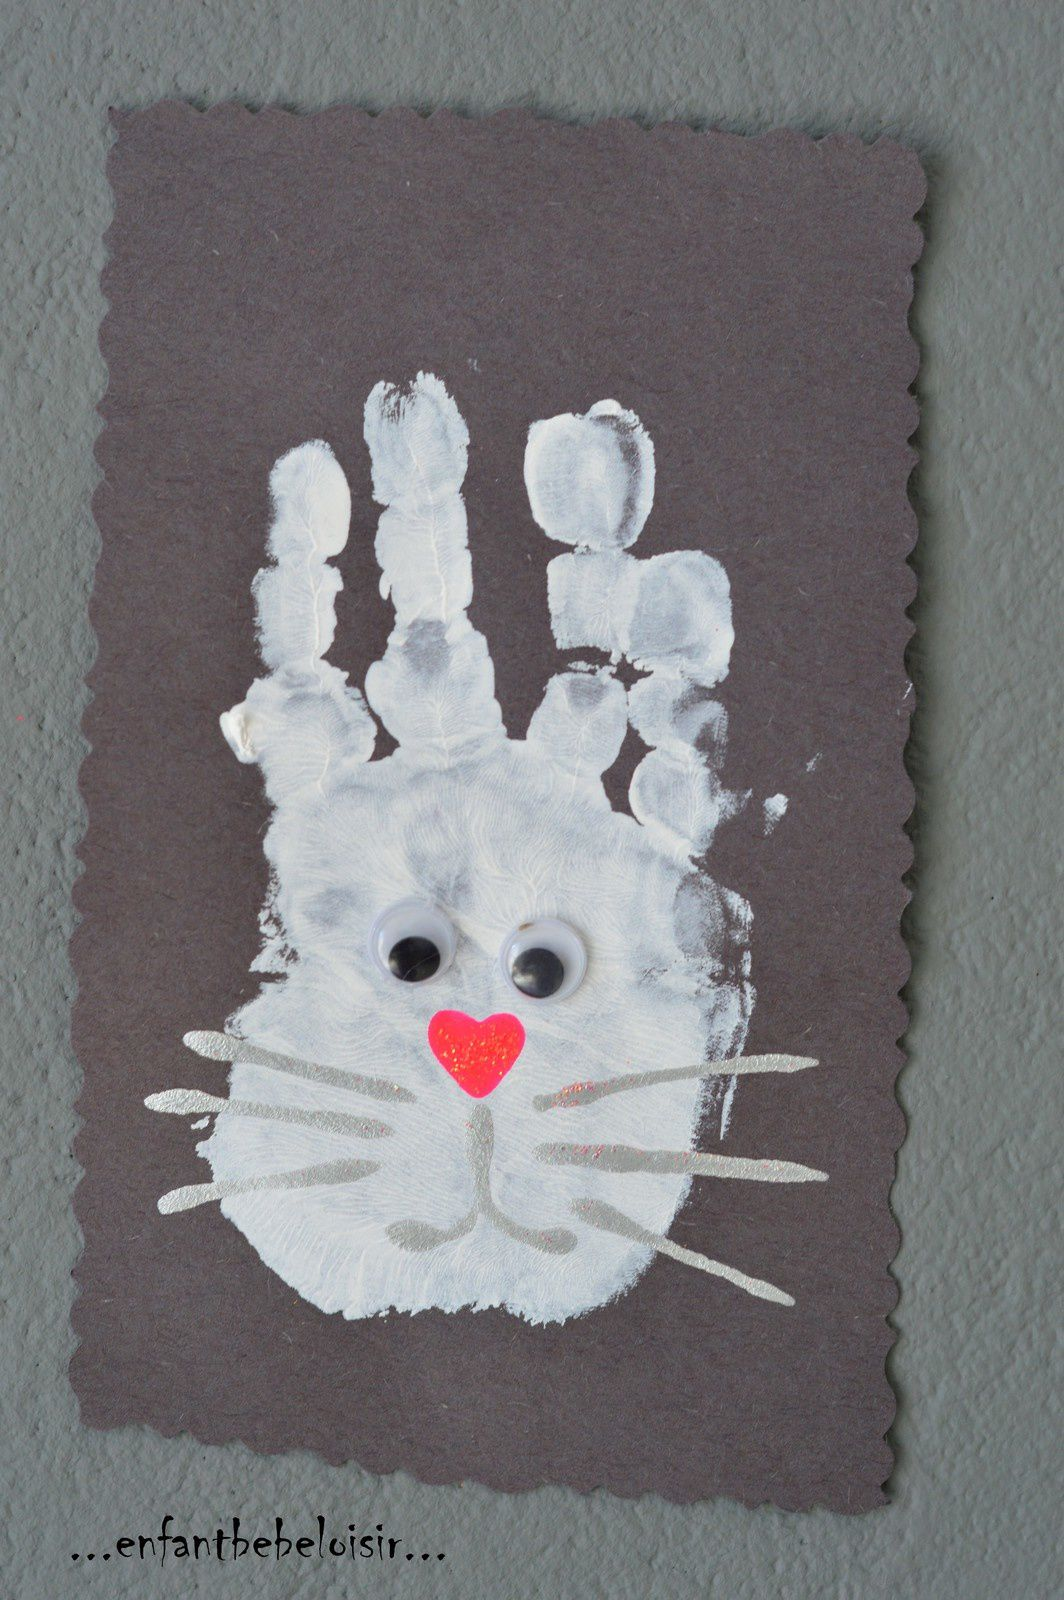 L 39 univers de bebe enfant b b loisir - Idee peinture enfant ...